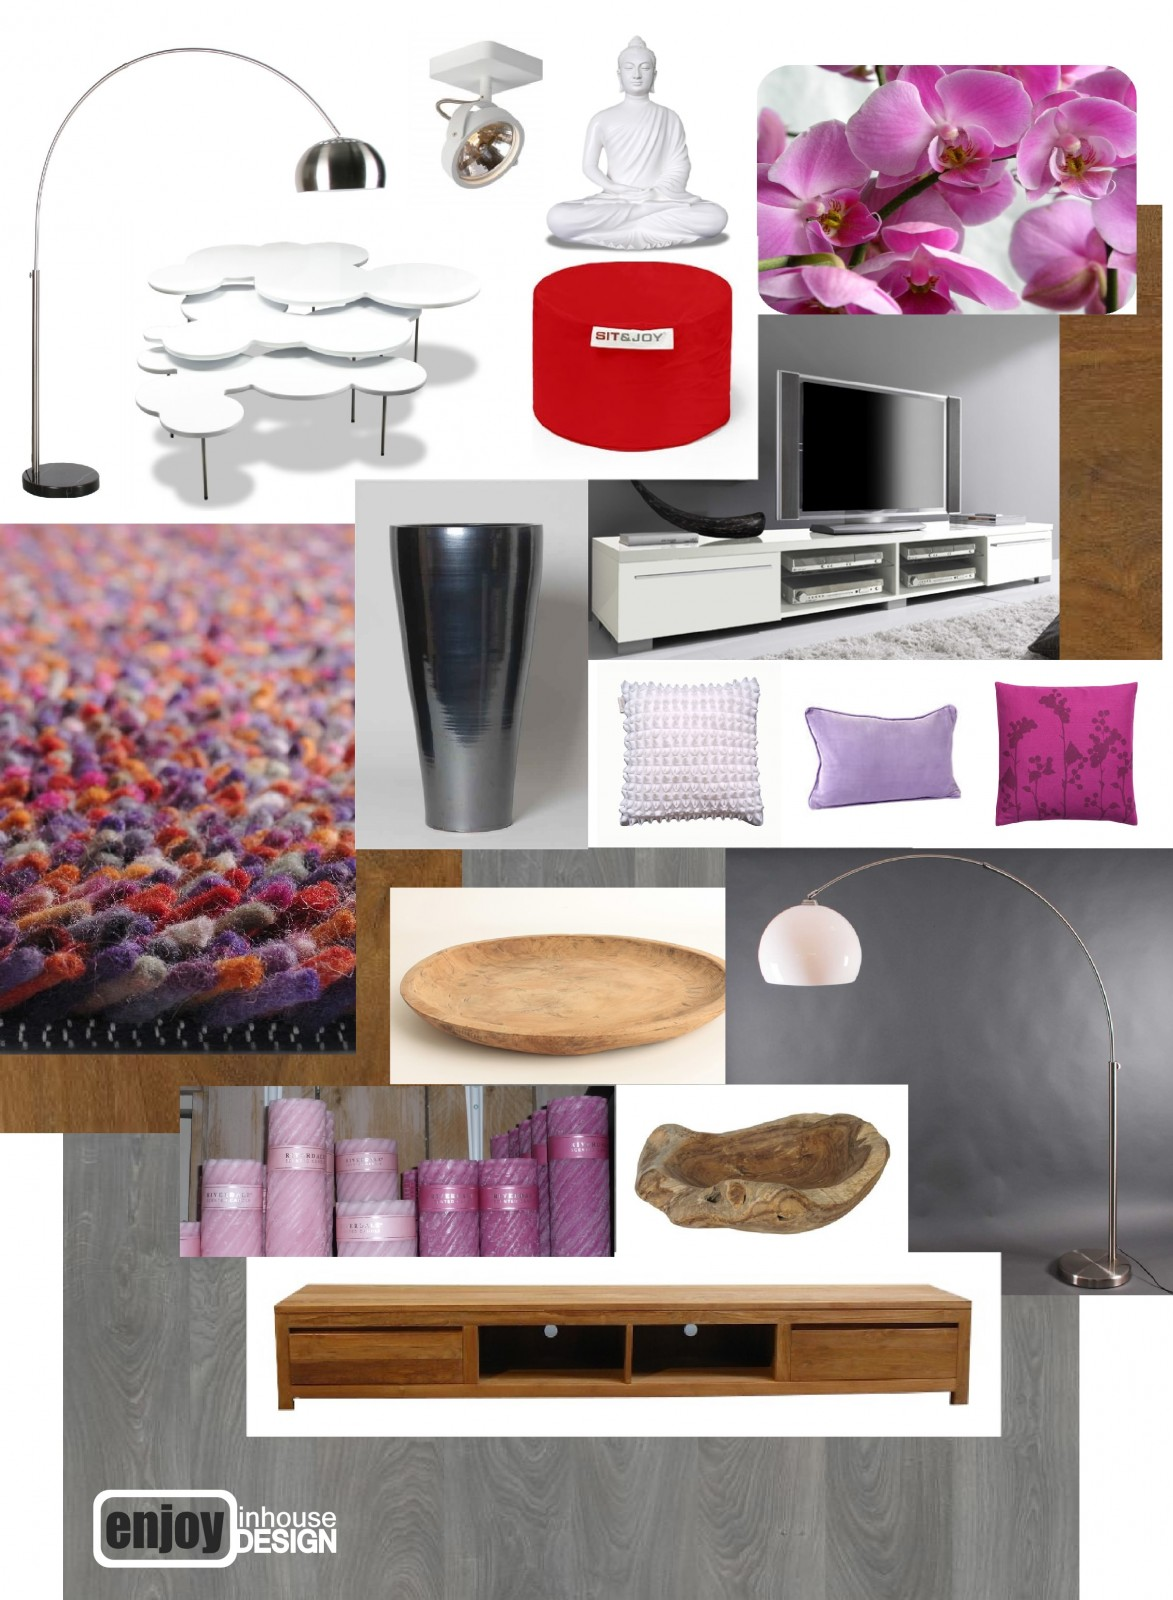 Enjoy Inhouse Design re-styling woonkamer - Barendrecht - Enjoy ...